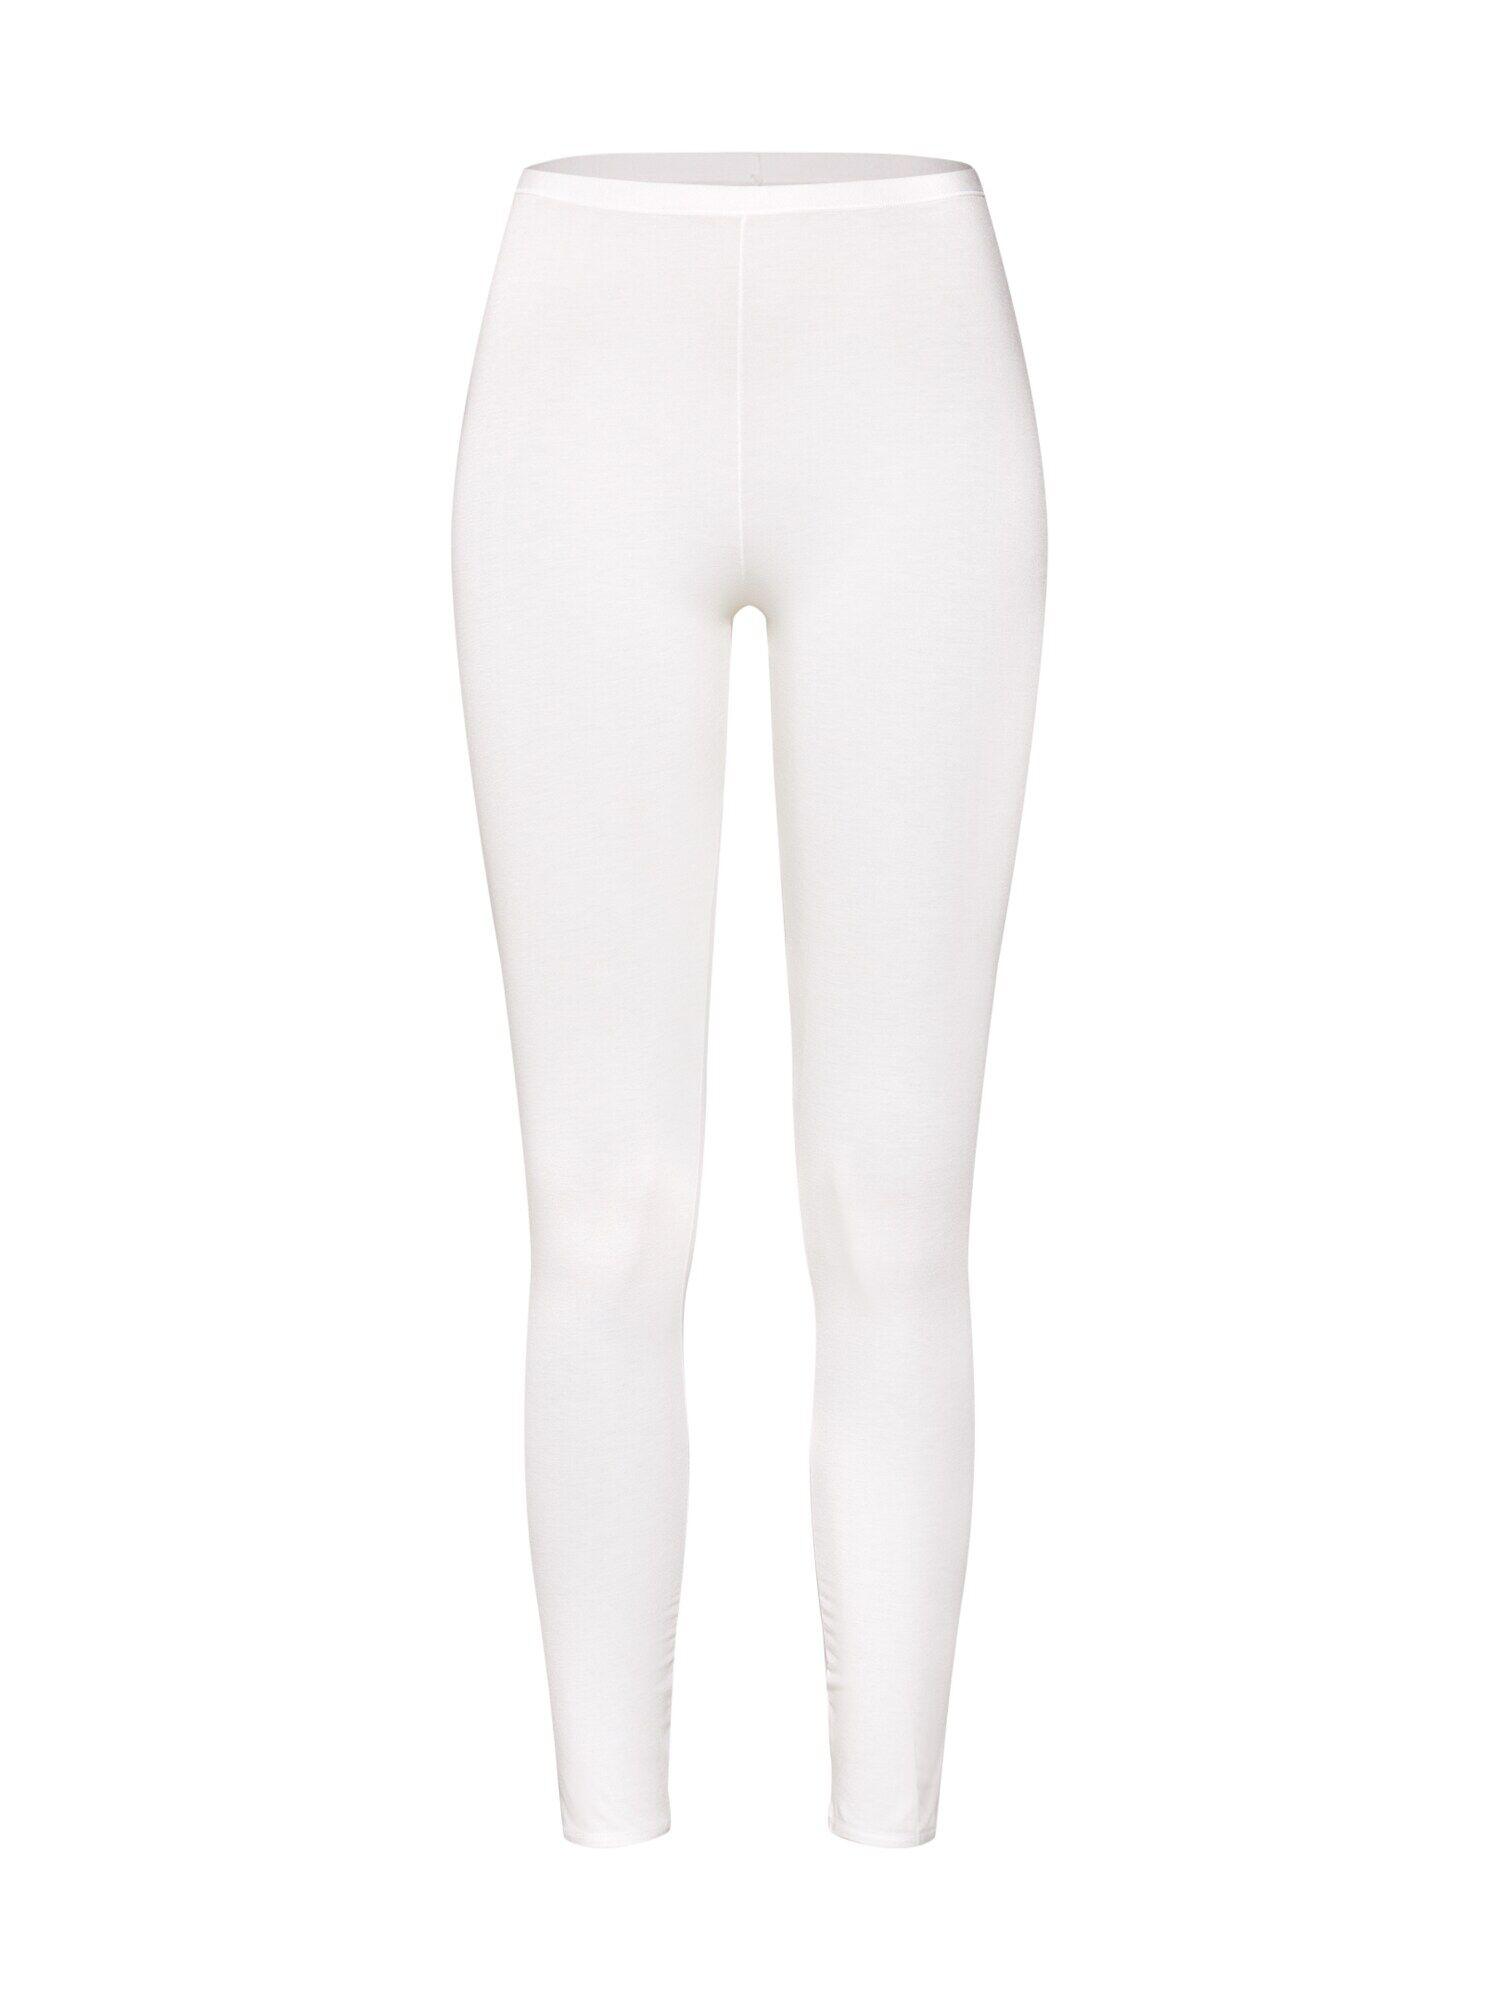 SCHIESSER Pantalon de pyjama 'Personal Fit'  - Blanc - Taille: XXL - female